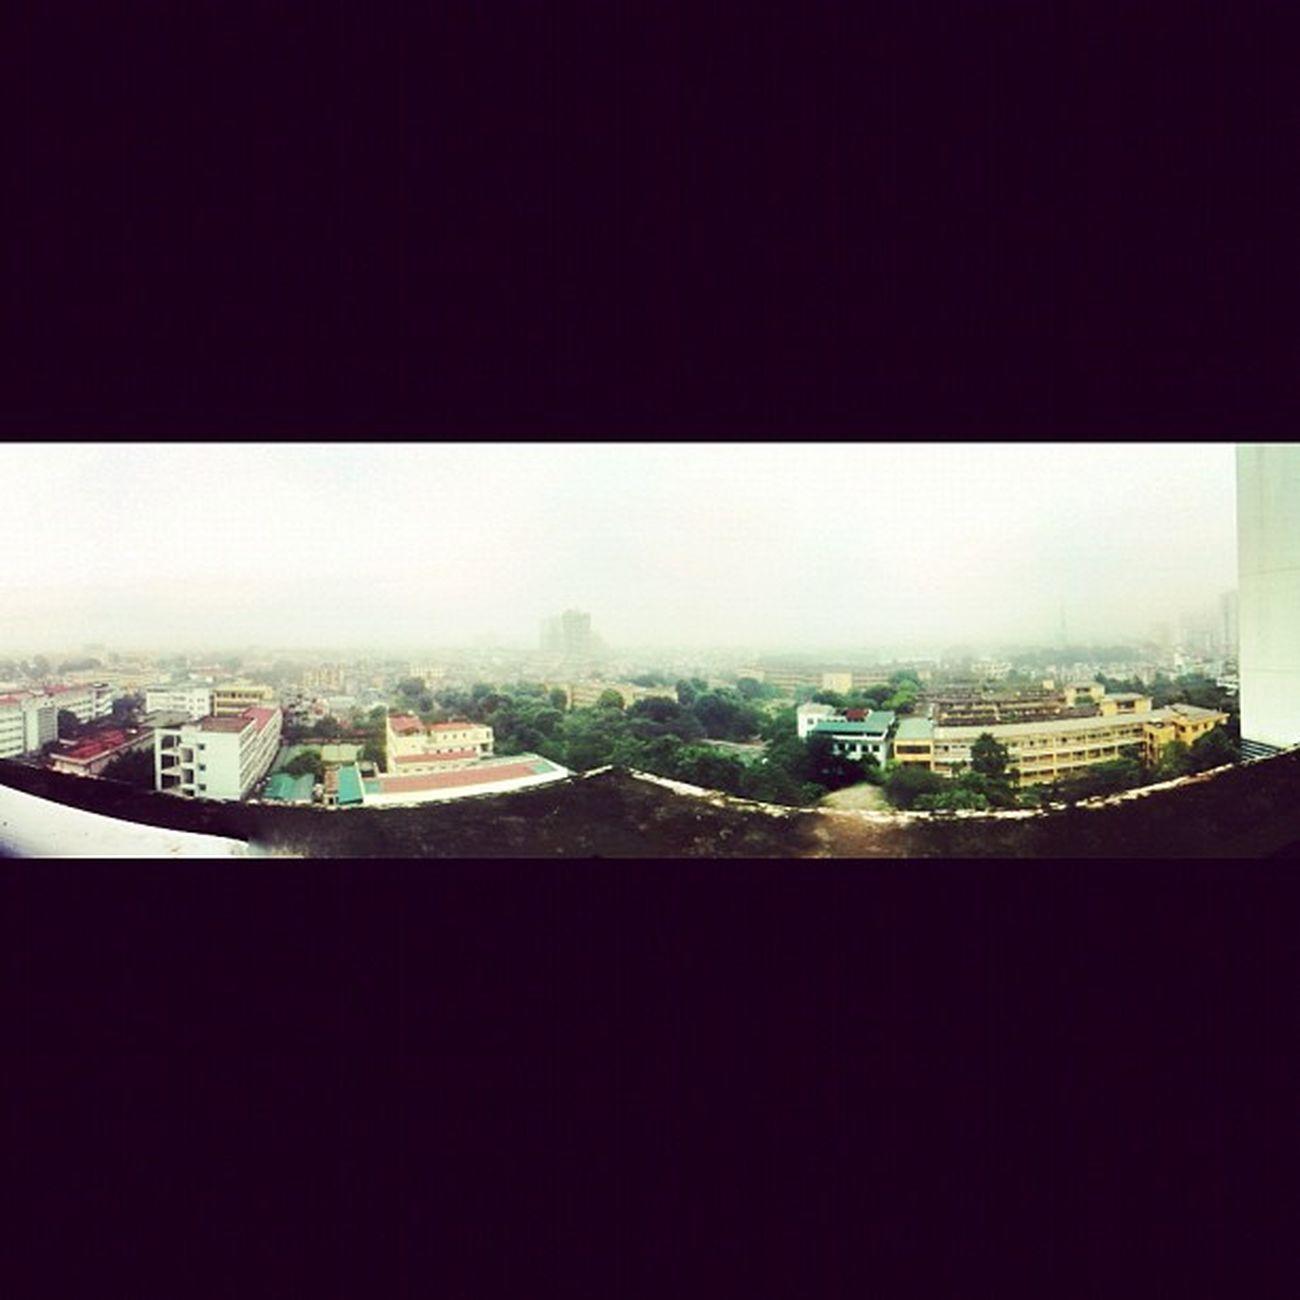 Zời cứ mịt mù luôn Panorama